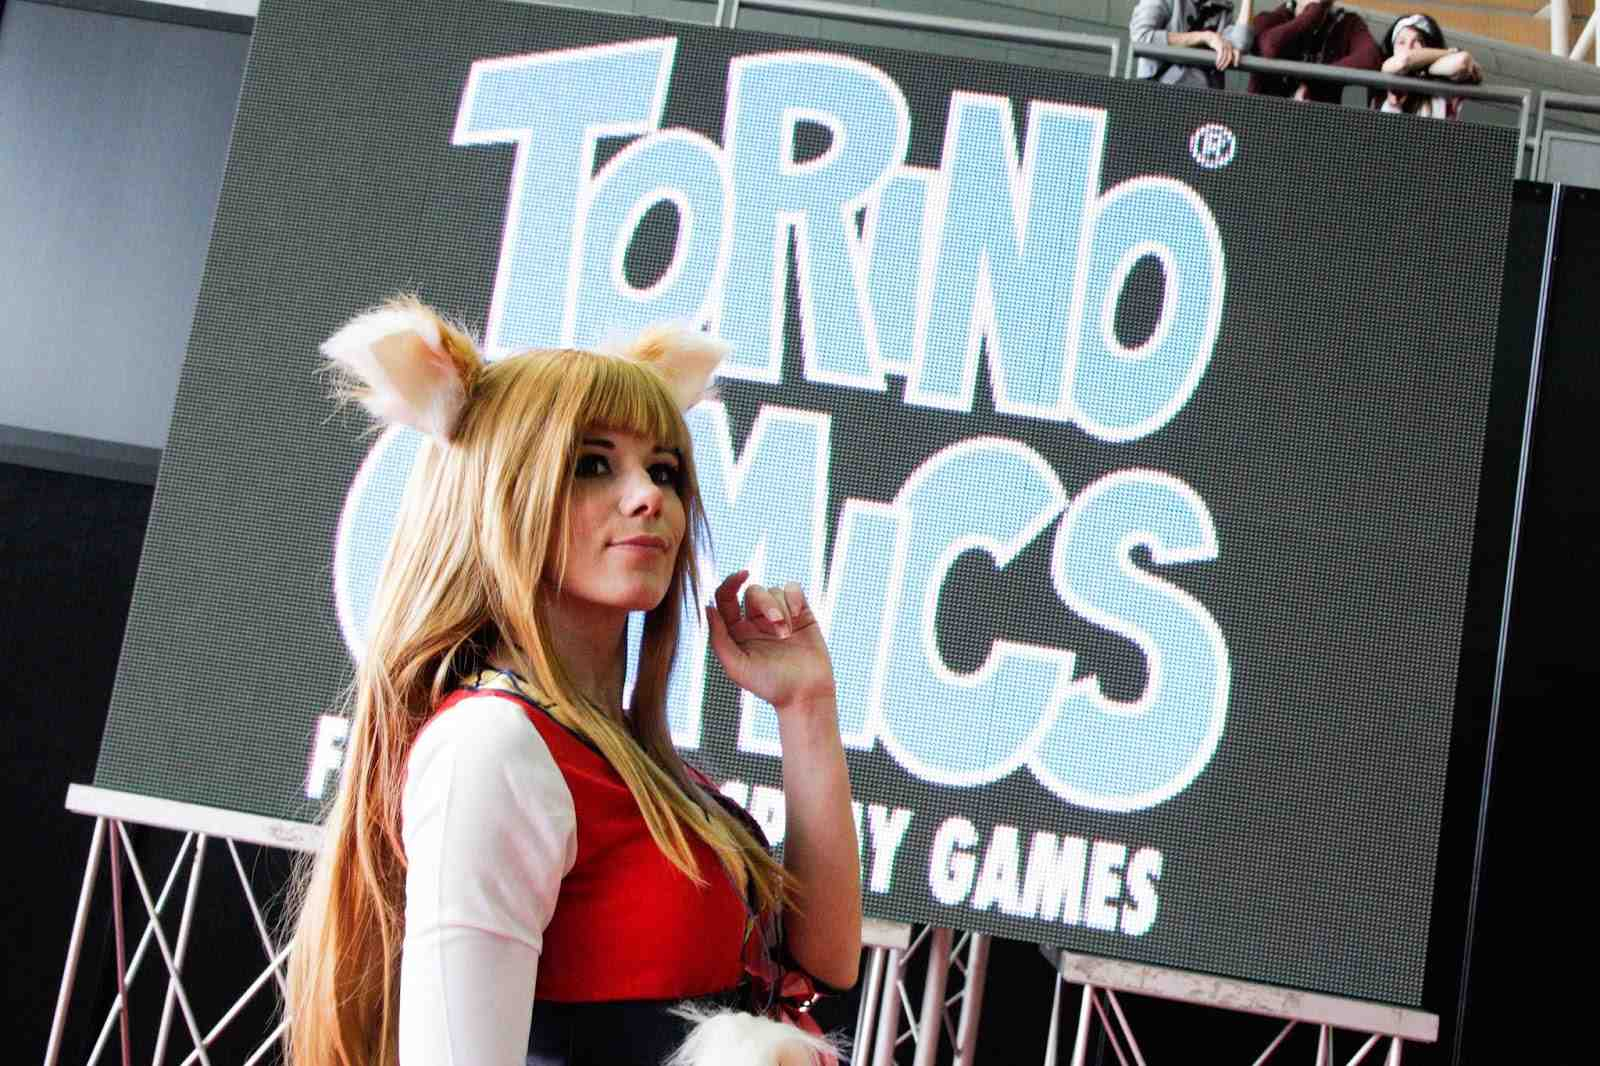 GG torino comics 2019